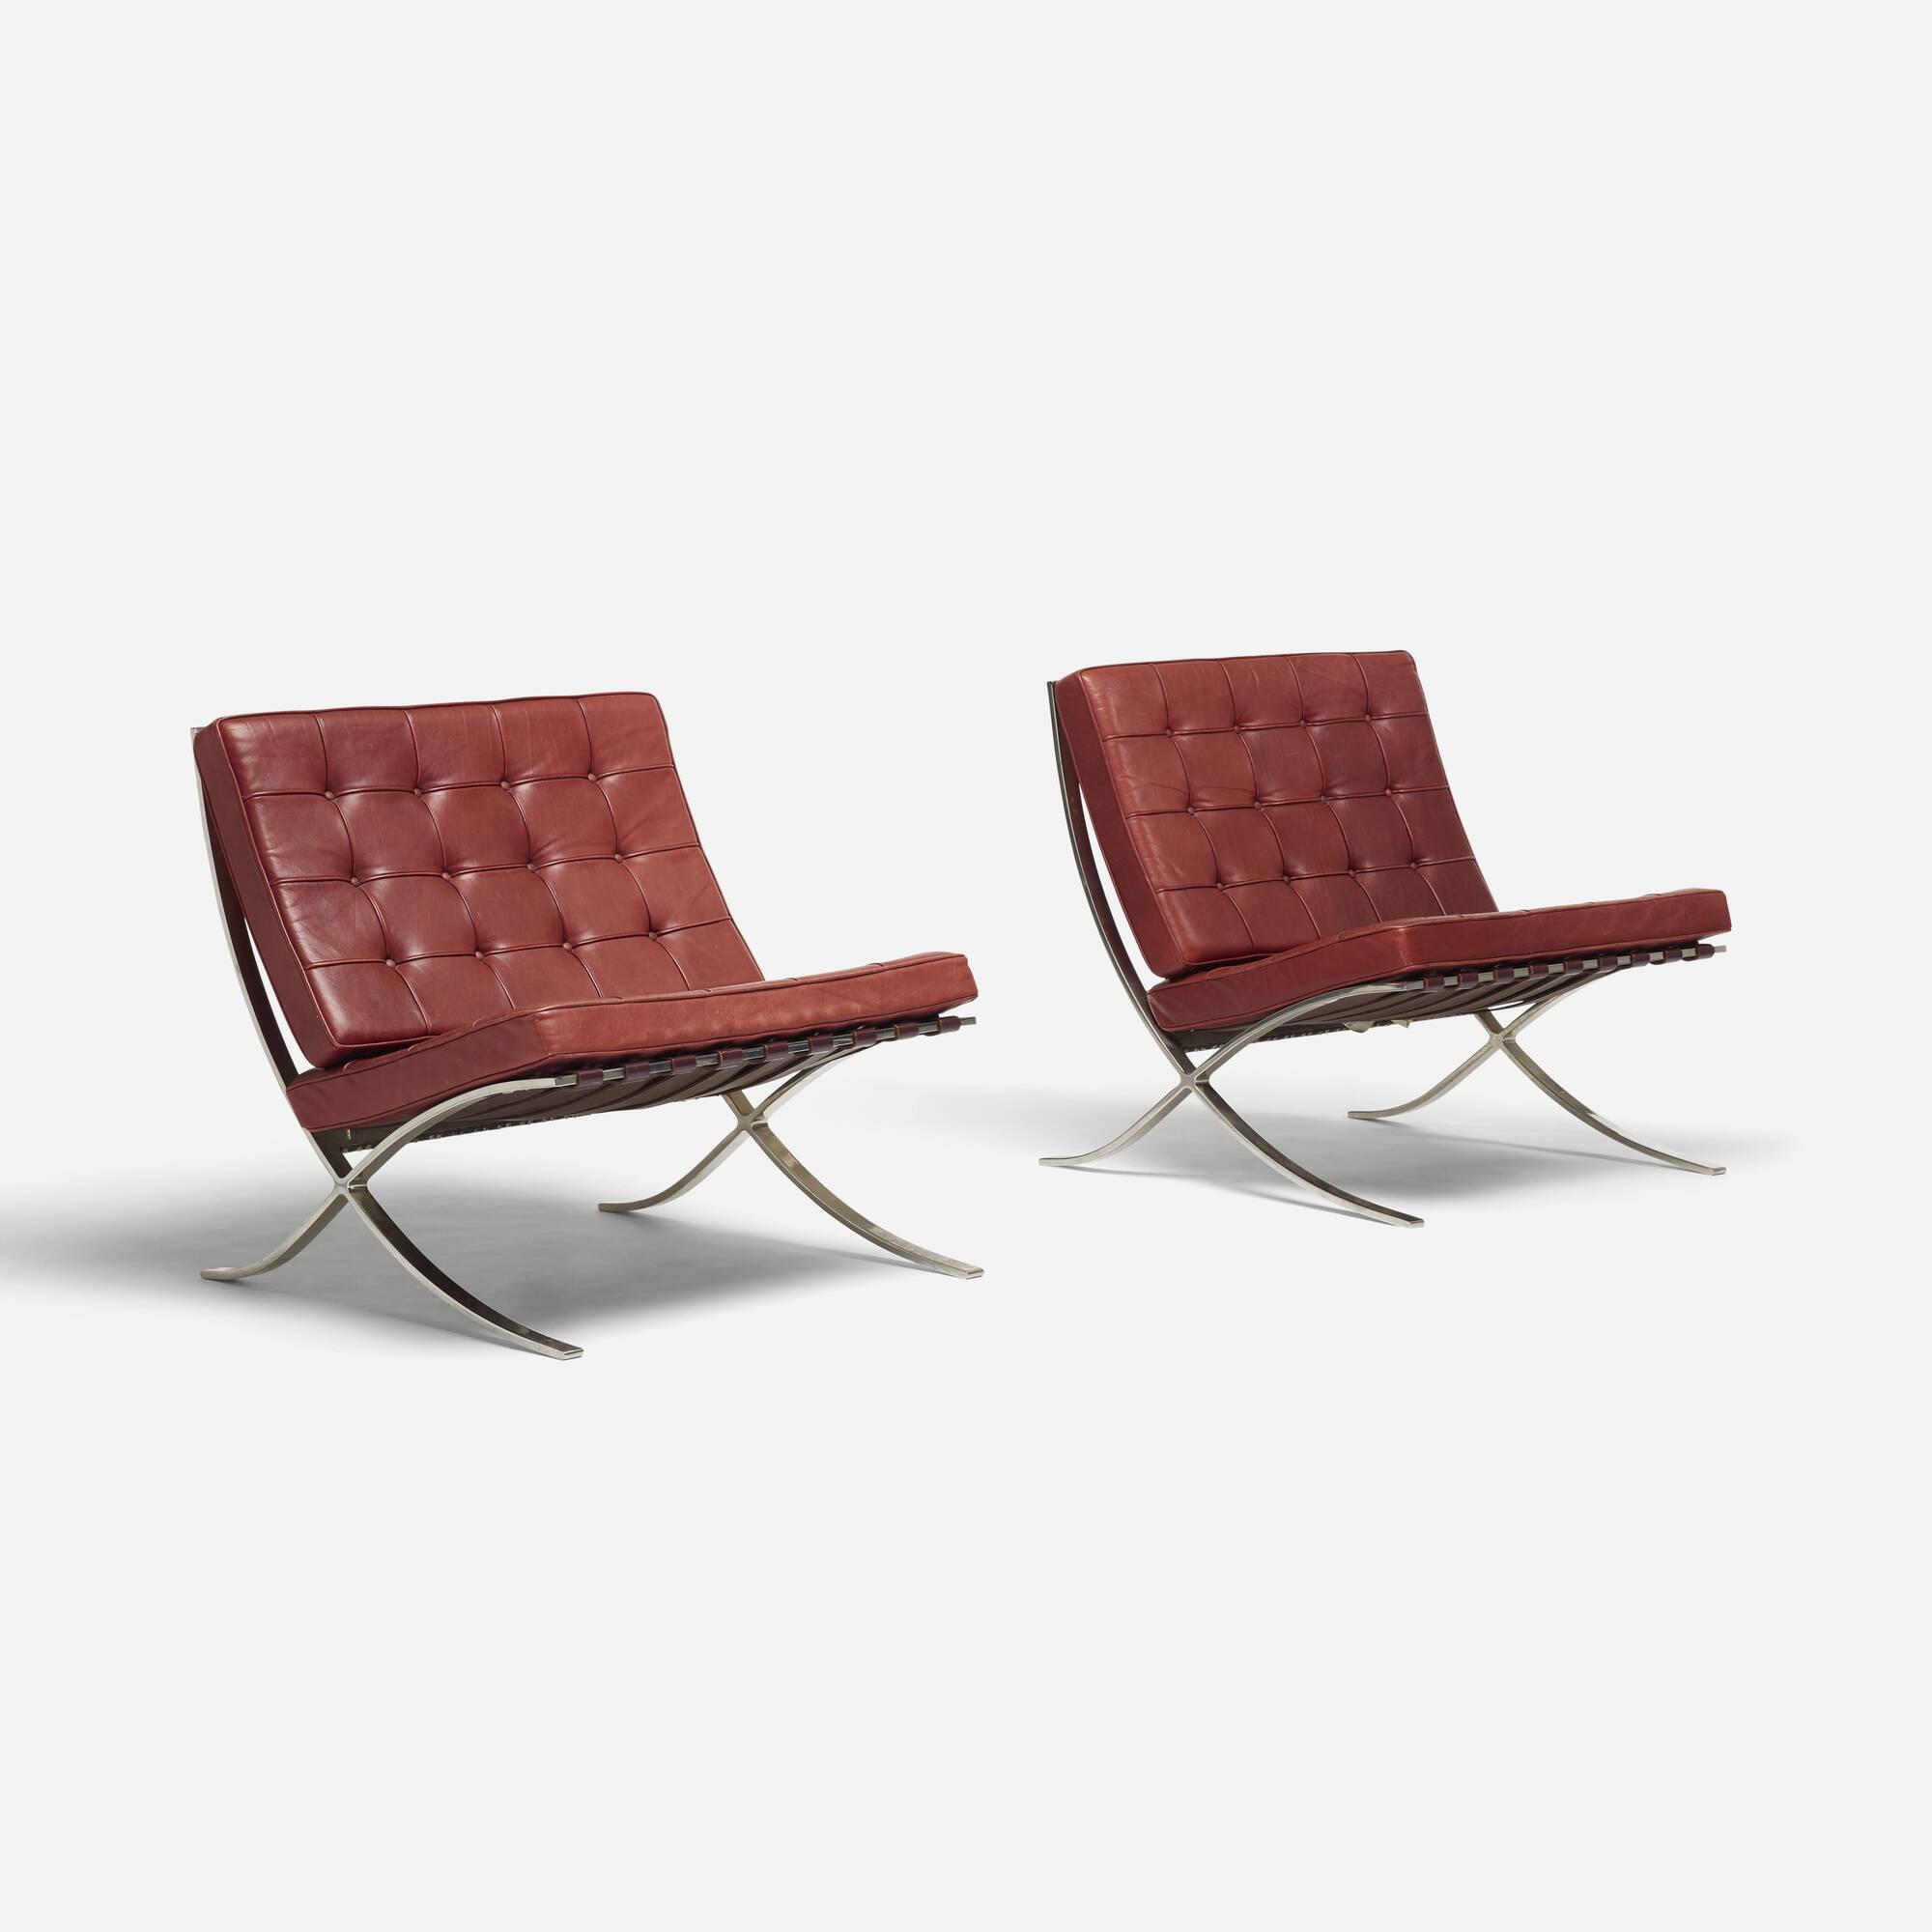 184 Ludwig Mies van der Rohe Barcelona chairs pair Design